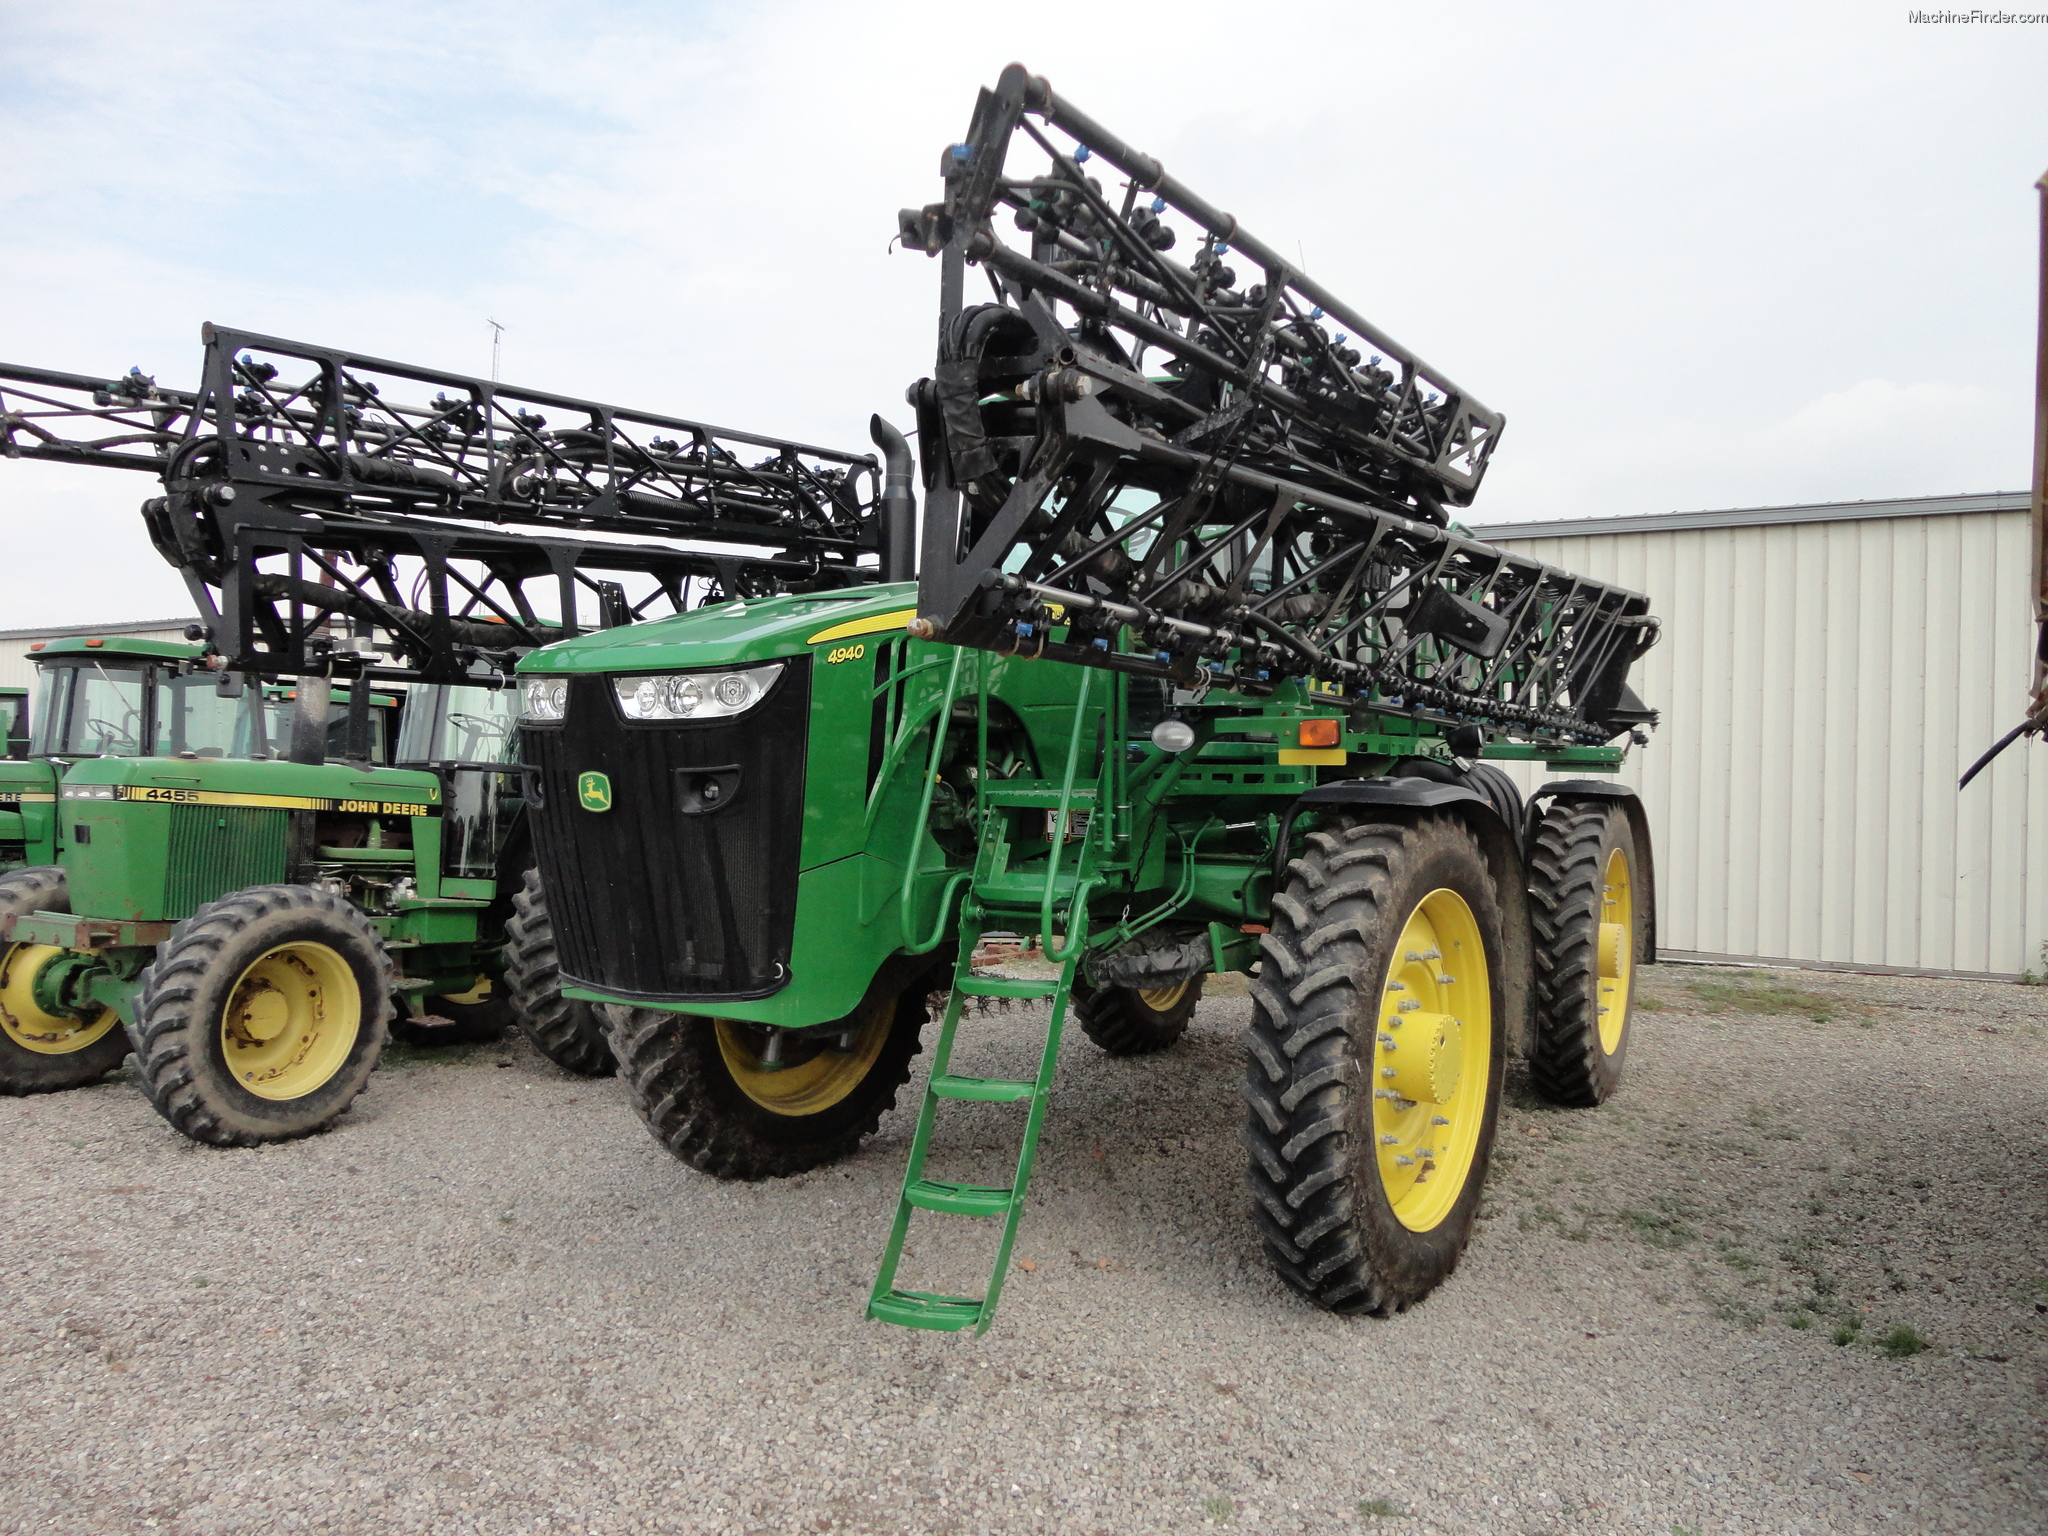 Tractor Pto Sprayer : John deere pto boom sprayers bing images